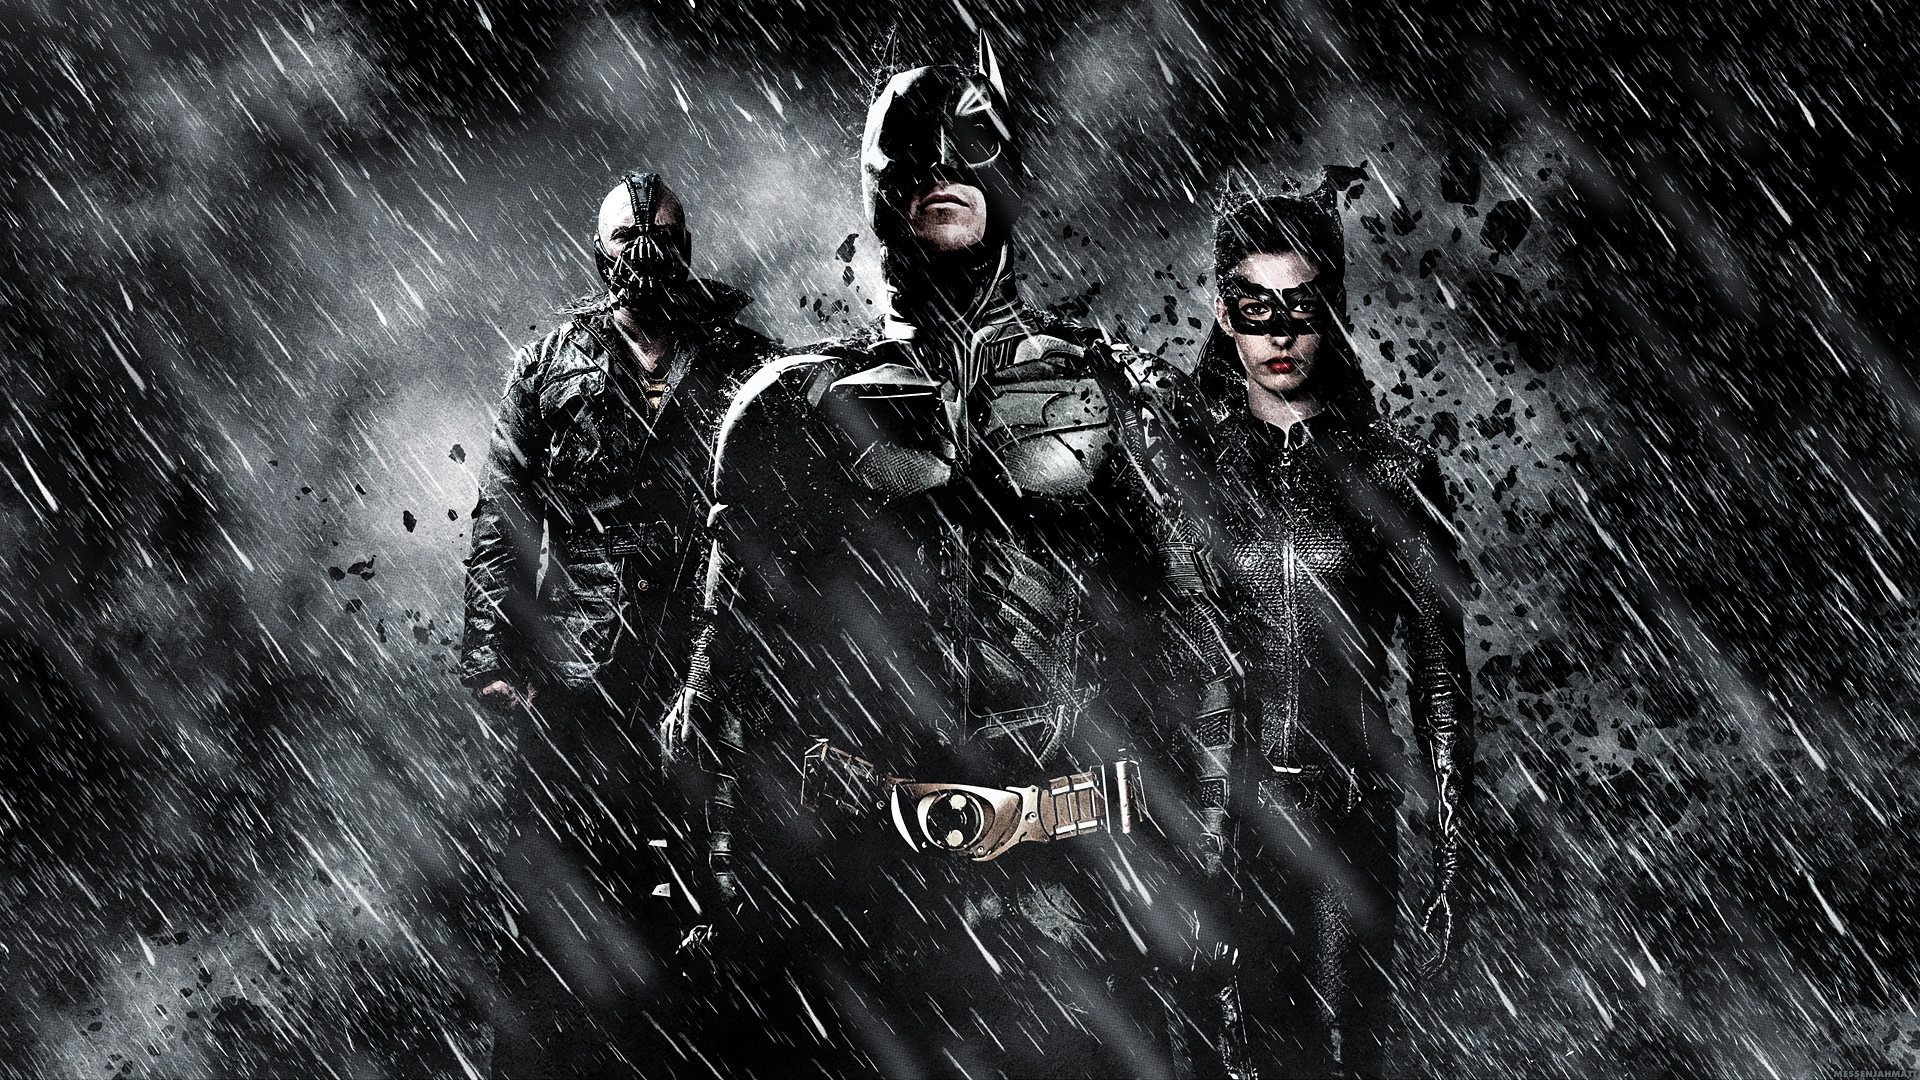 the_dark_knight_rises_movie-HD